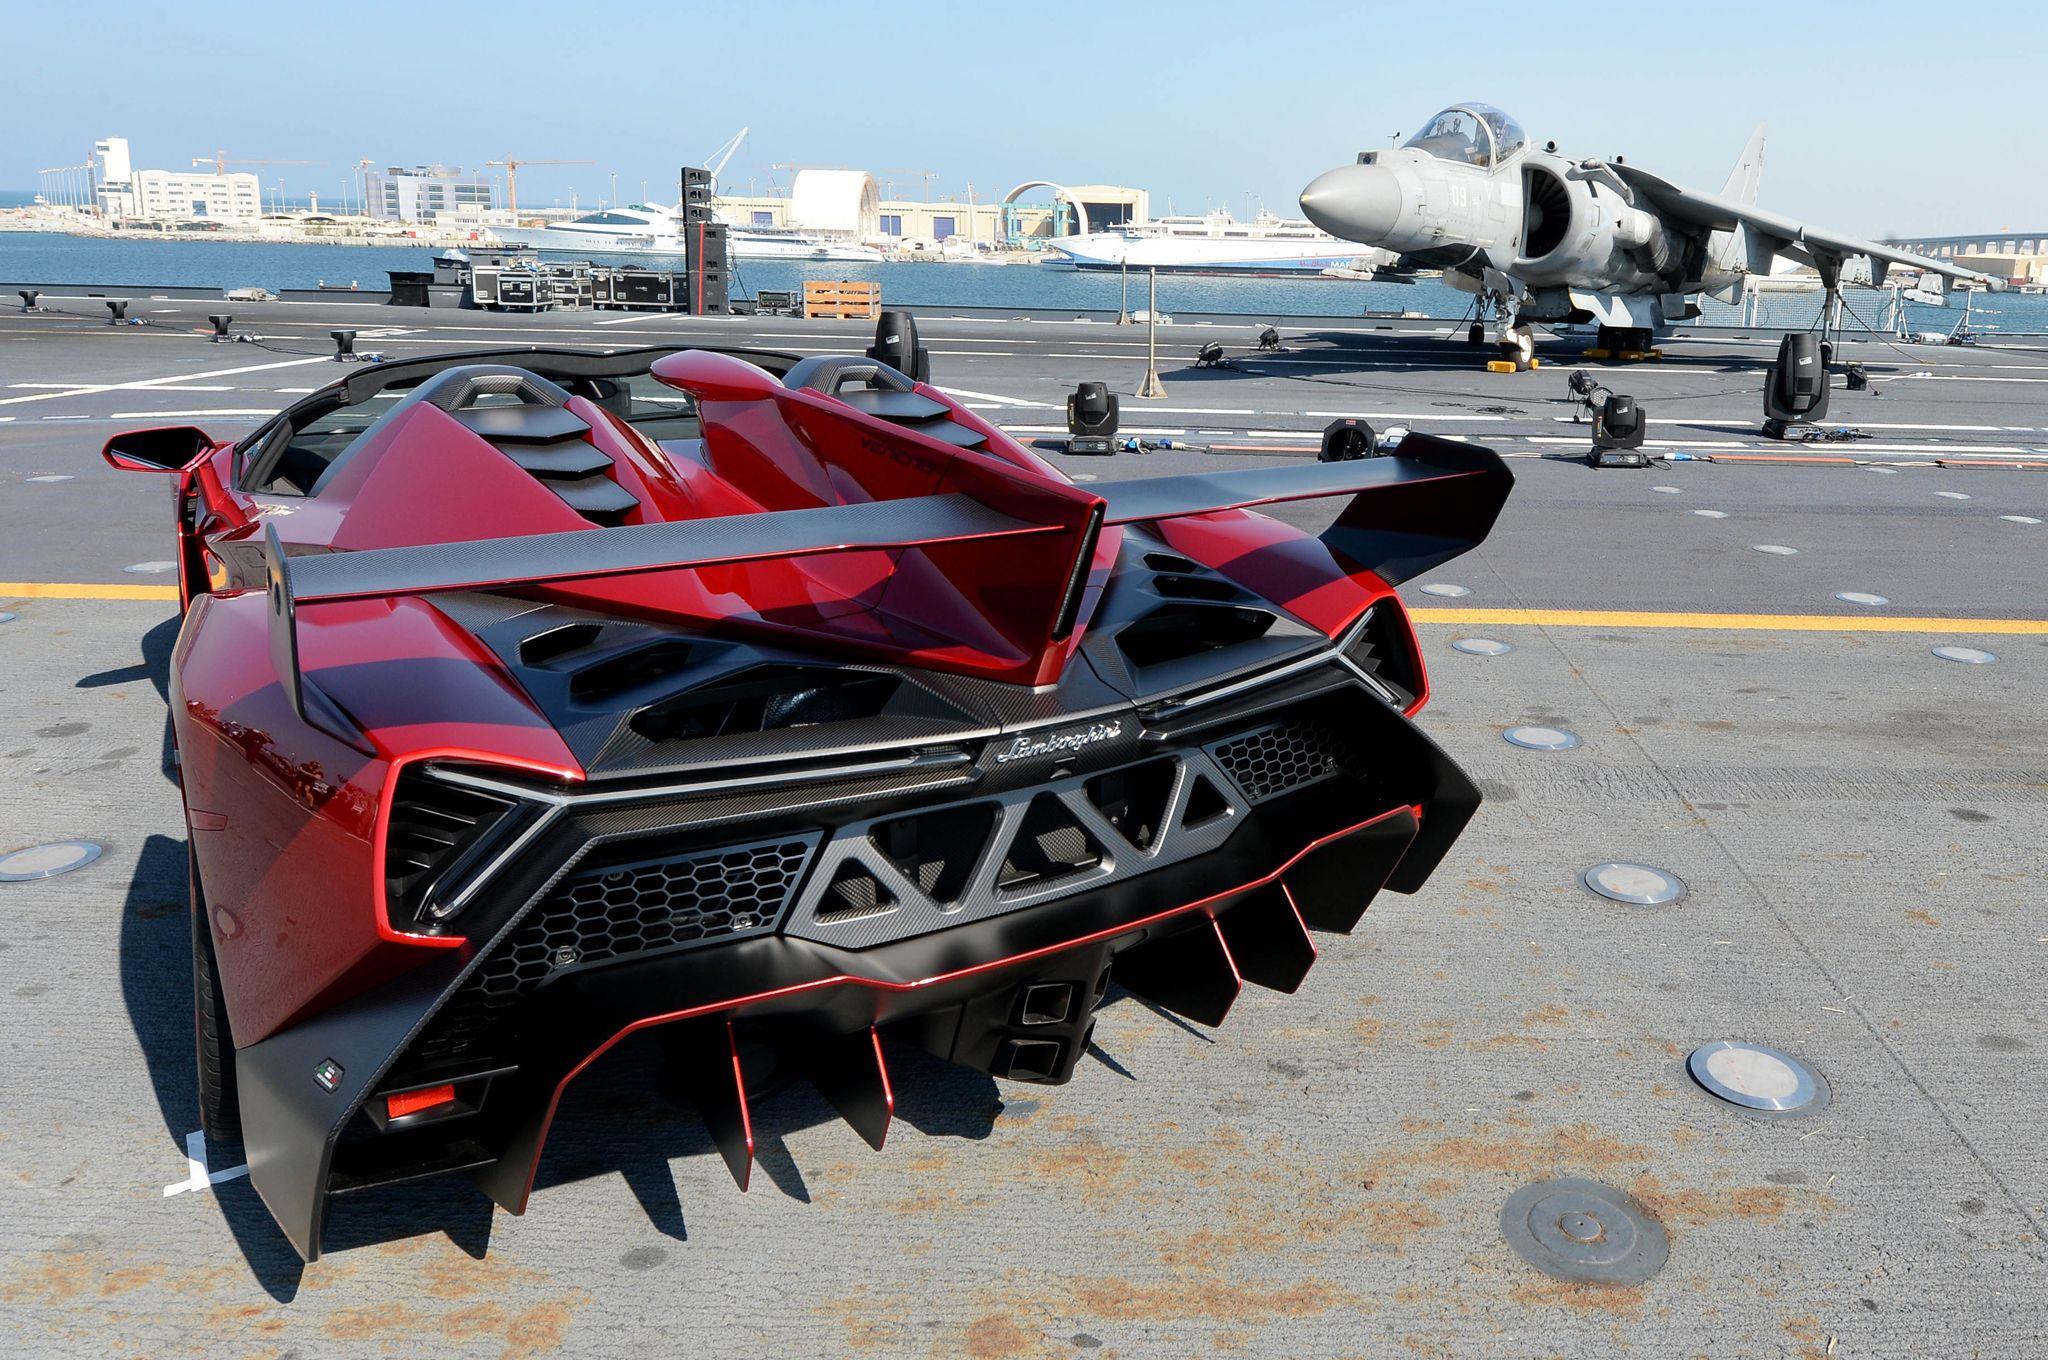 Lamborghini Veneno Roadster Lamborghini Veneno Lamborghini Veneno Roadster Lamborghini